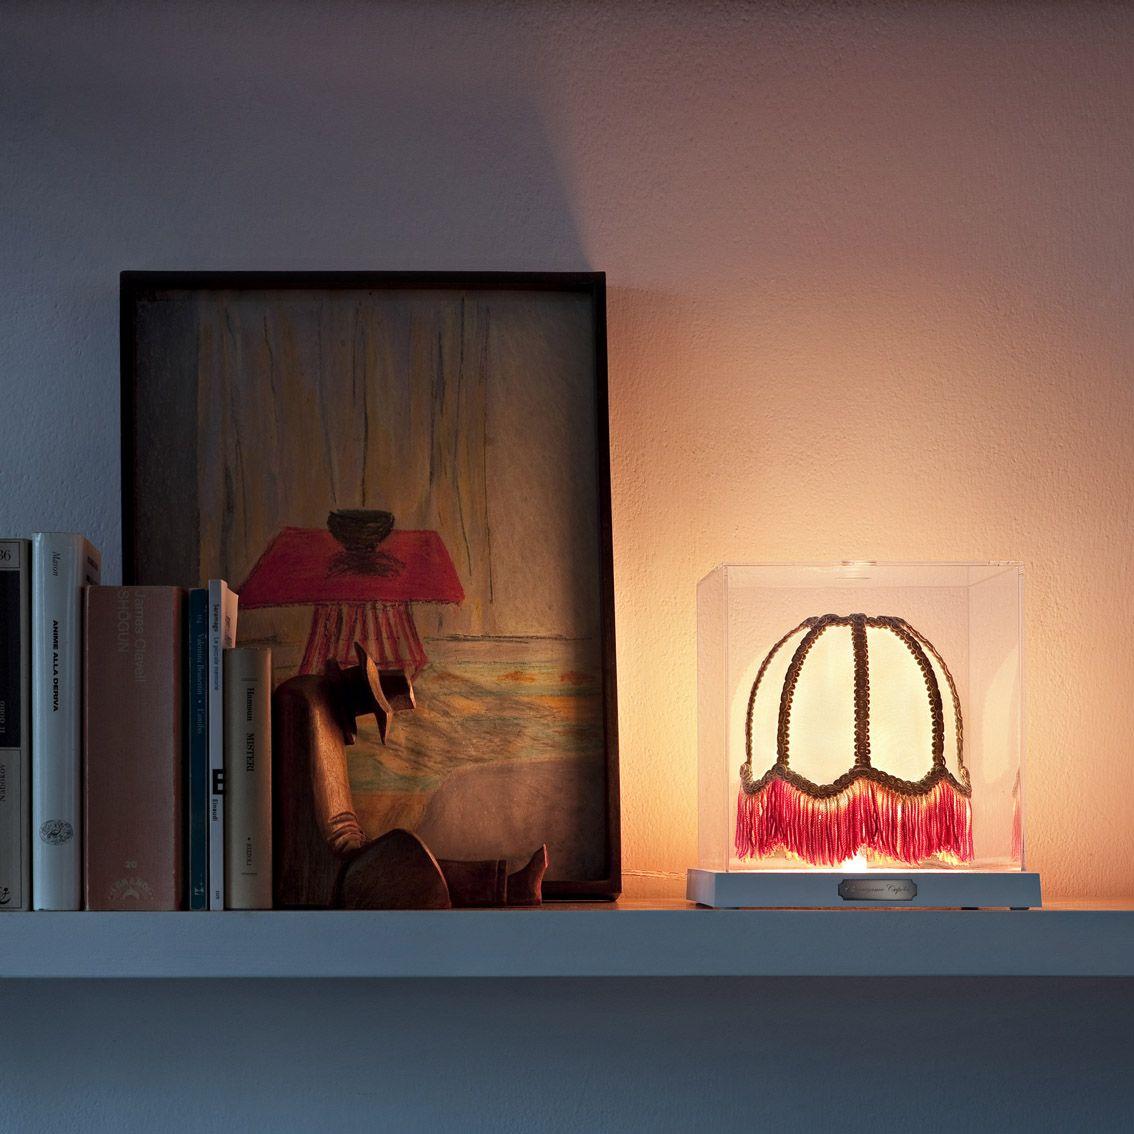 Illuminazione da tavolo Flos Mini Teca Renaissance Cupola #rifarecasa #maistatocosifacile grazie a #designbox & #designcard #idfsrl